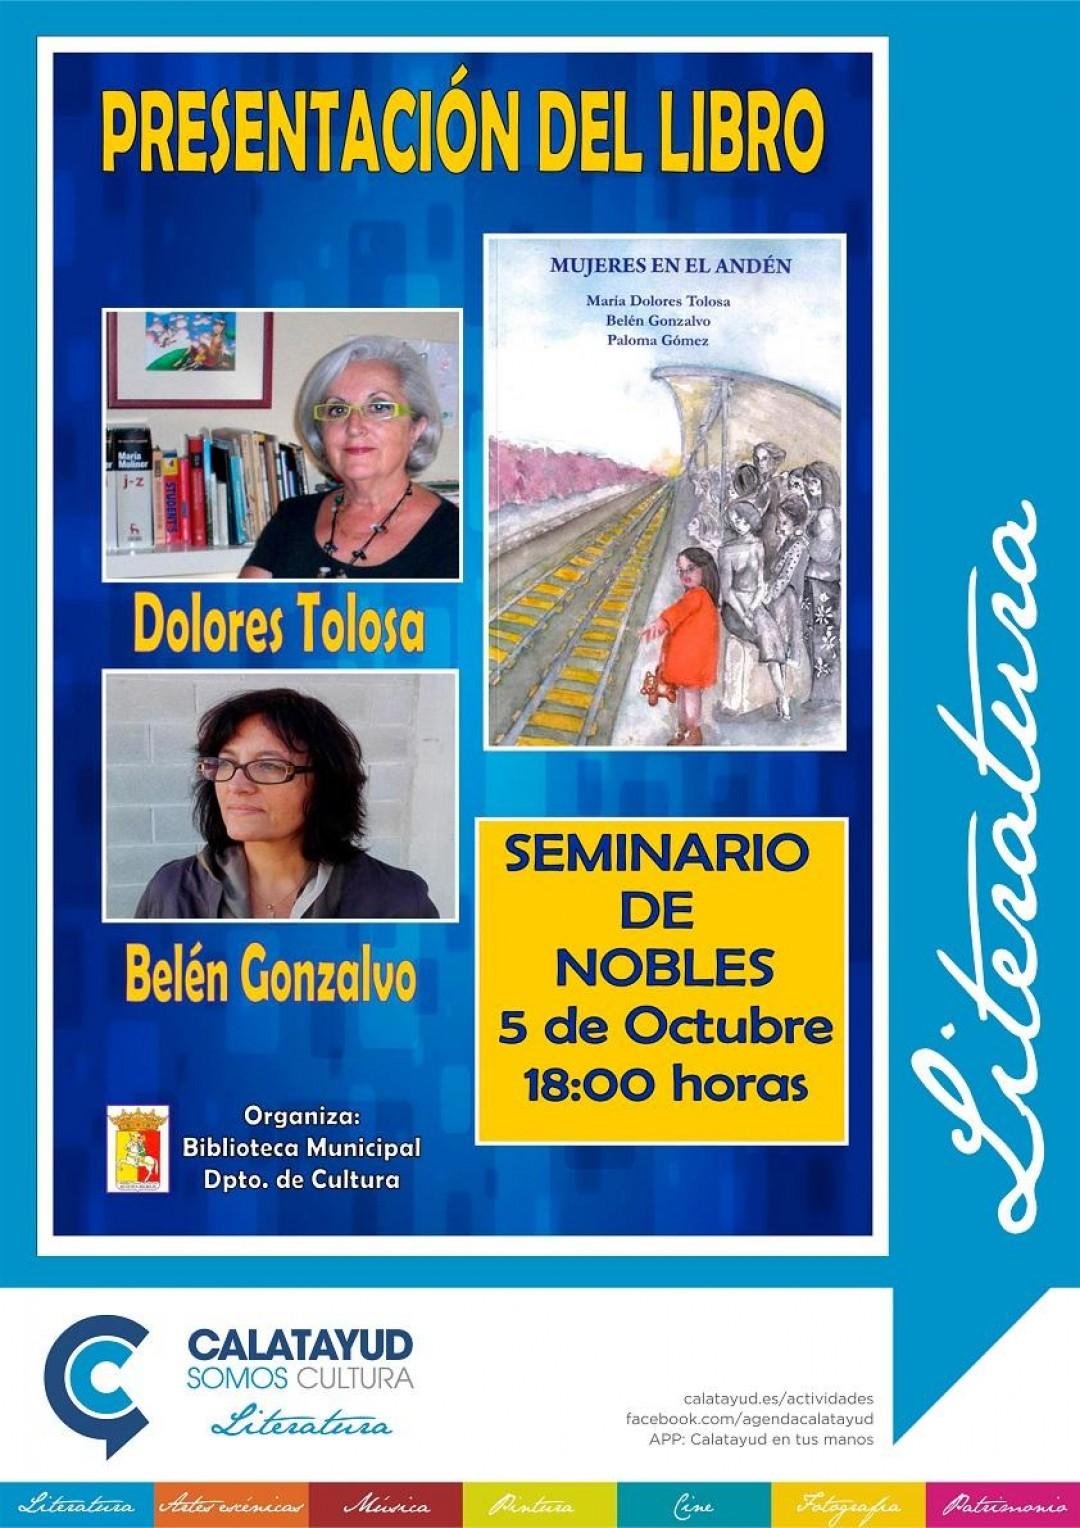 Contacto mujeres calatayud [PUNIQRANDLINE-(au-dating-names.txt) 24